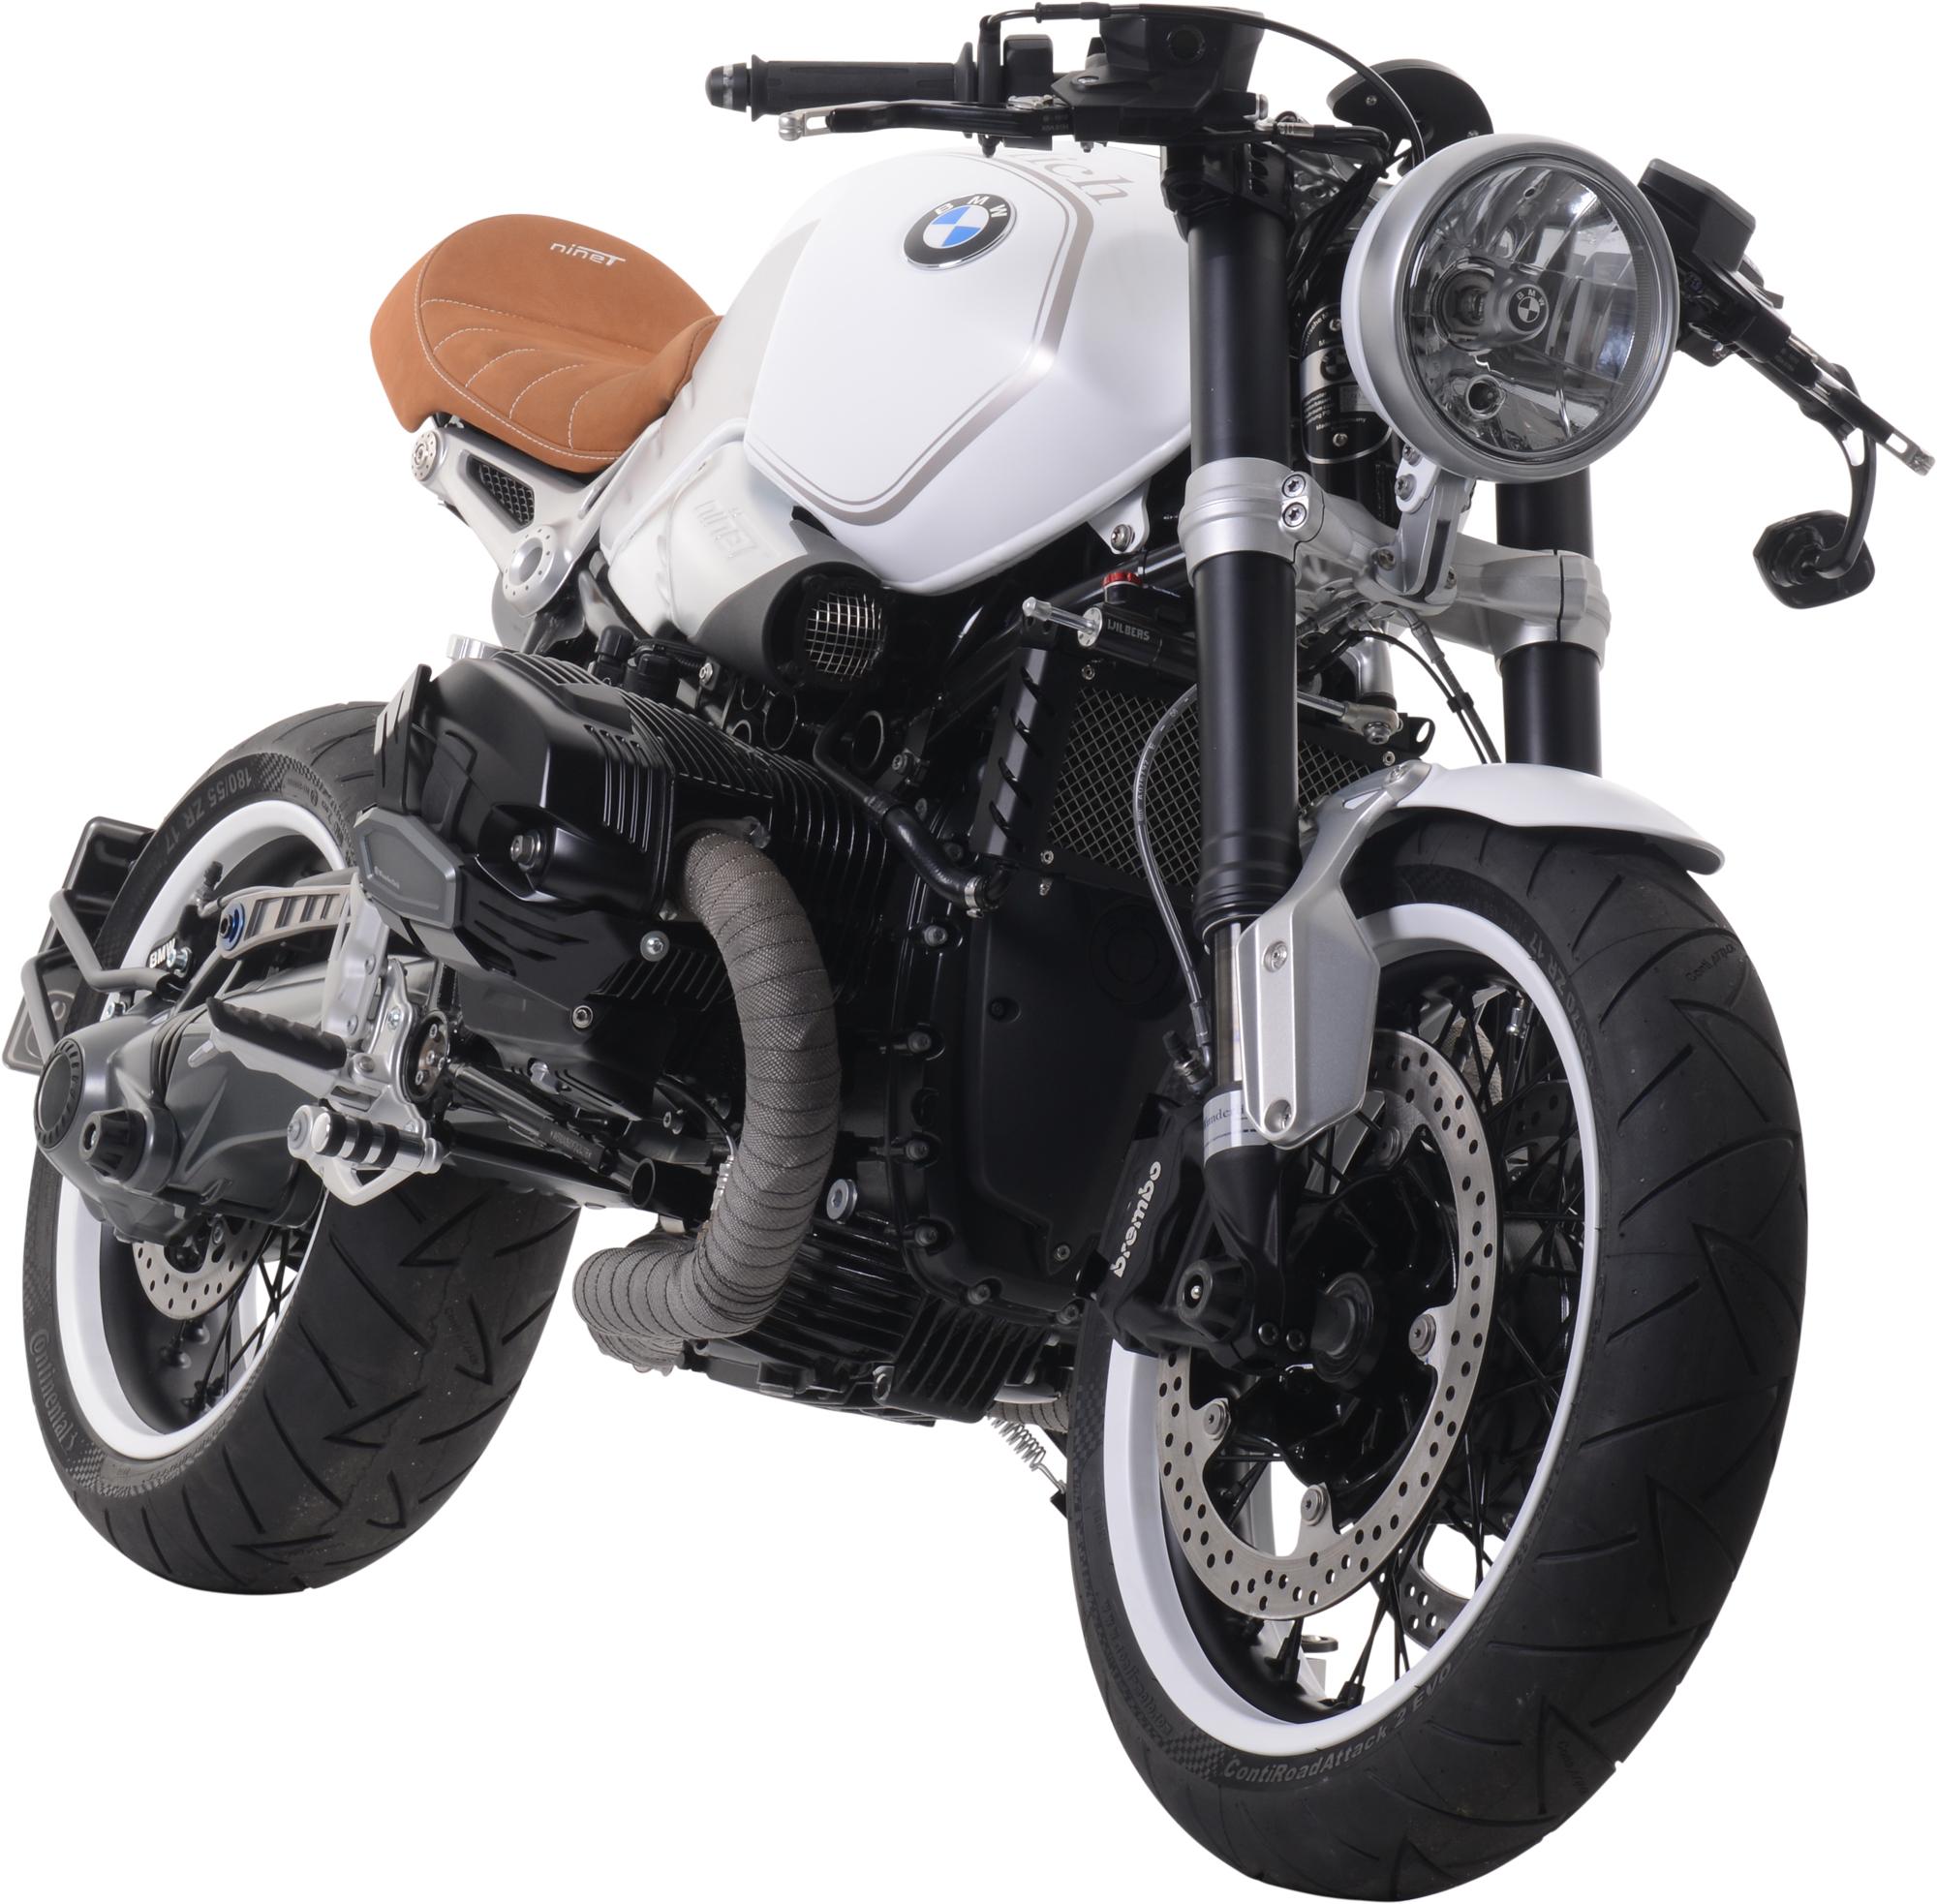 Purchase Ducati Scrambler Cafe Racer